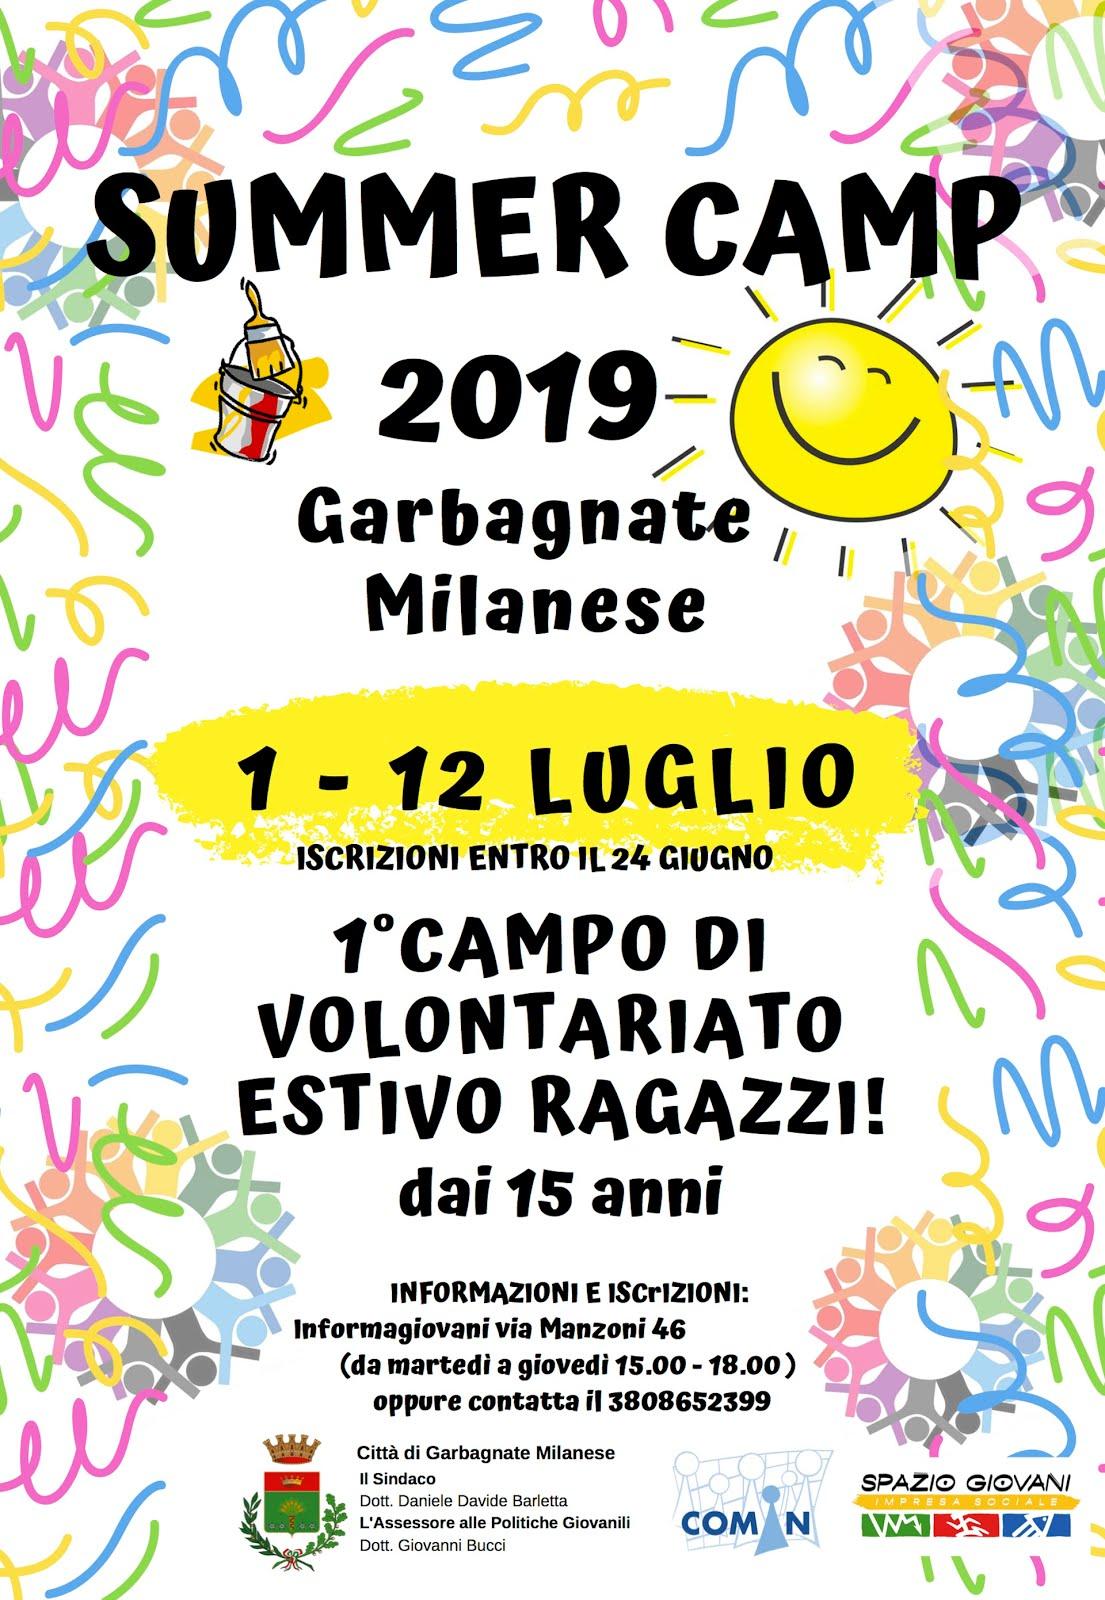 SUMMER CAMP GARBAGNATE M.SE